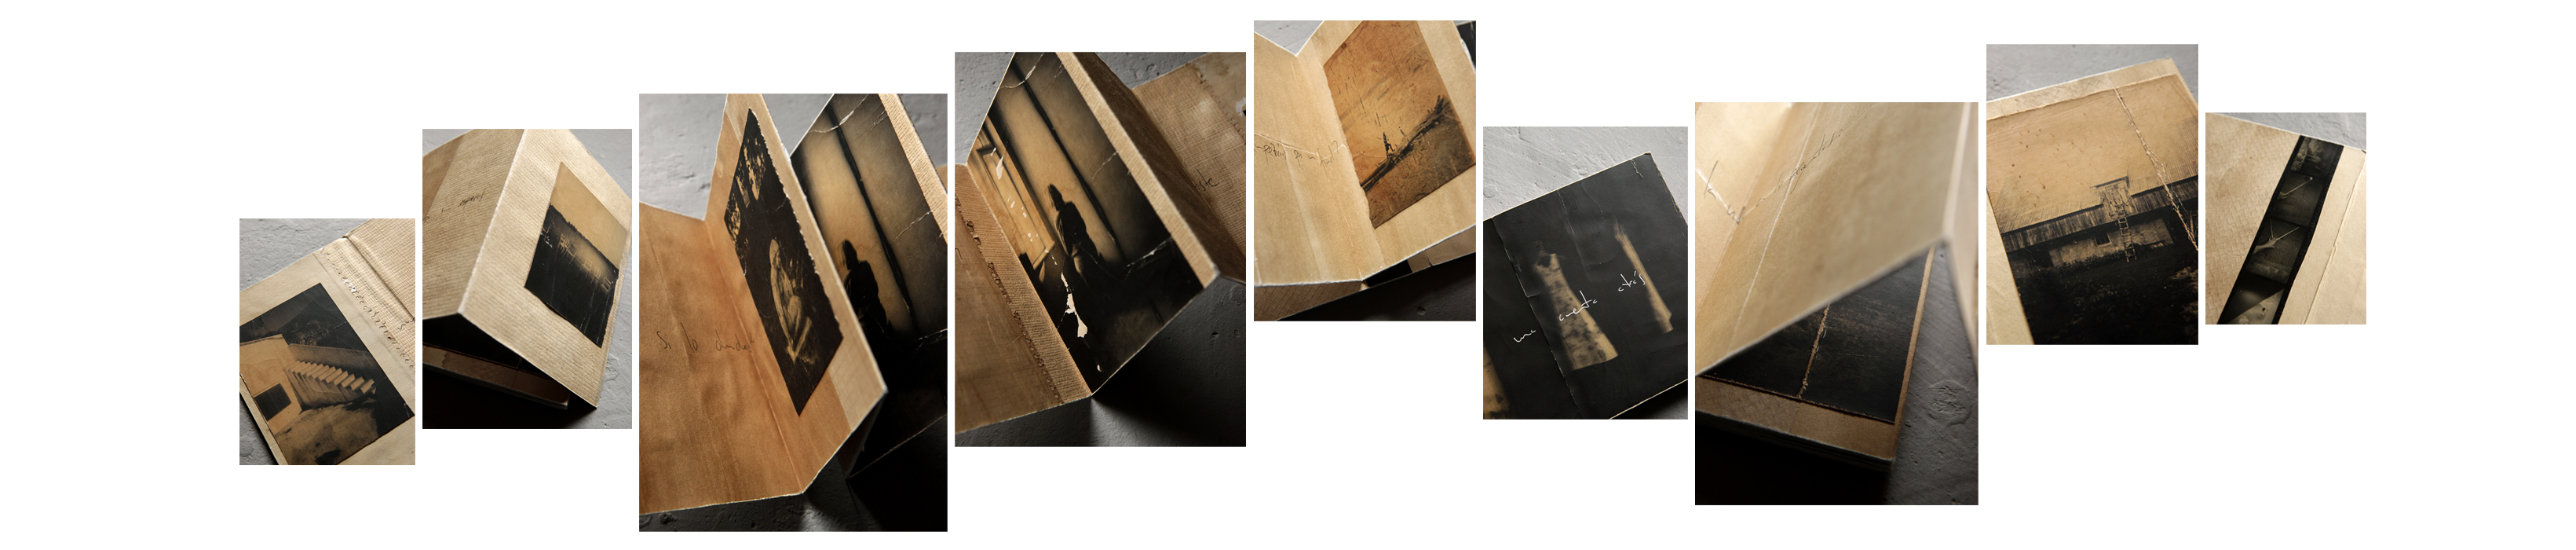 http://www.nodetenerse.com/files/gimgs/149_montajemapaweb07.jpg